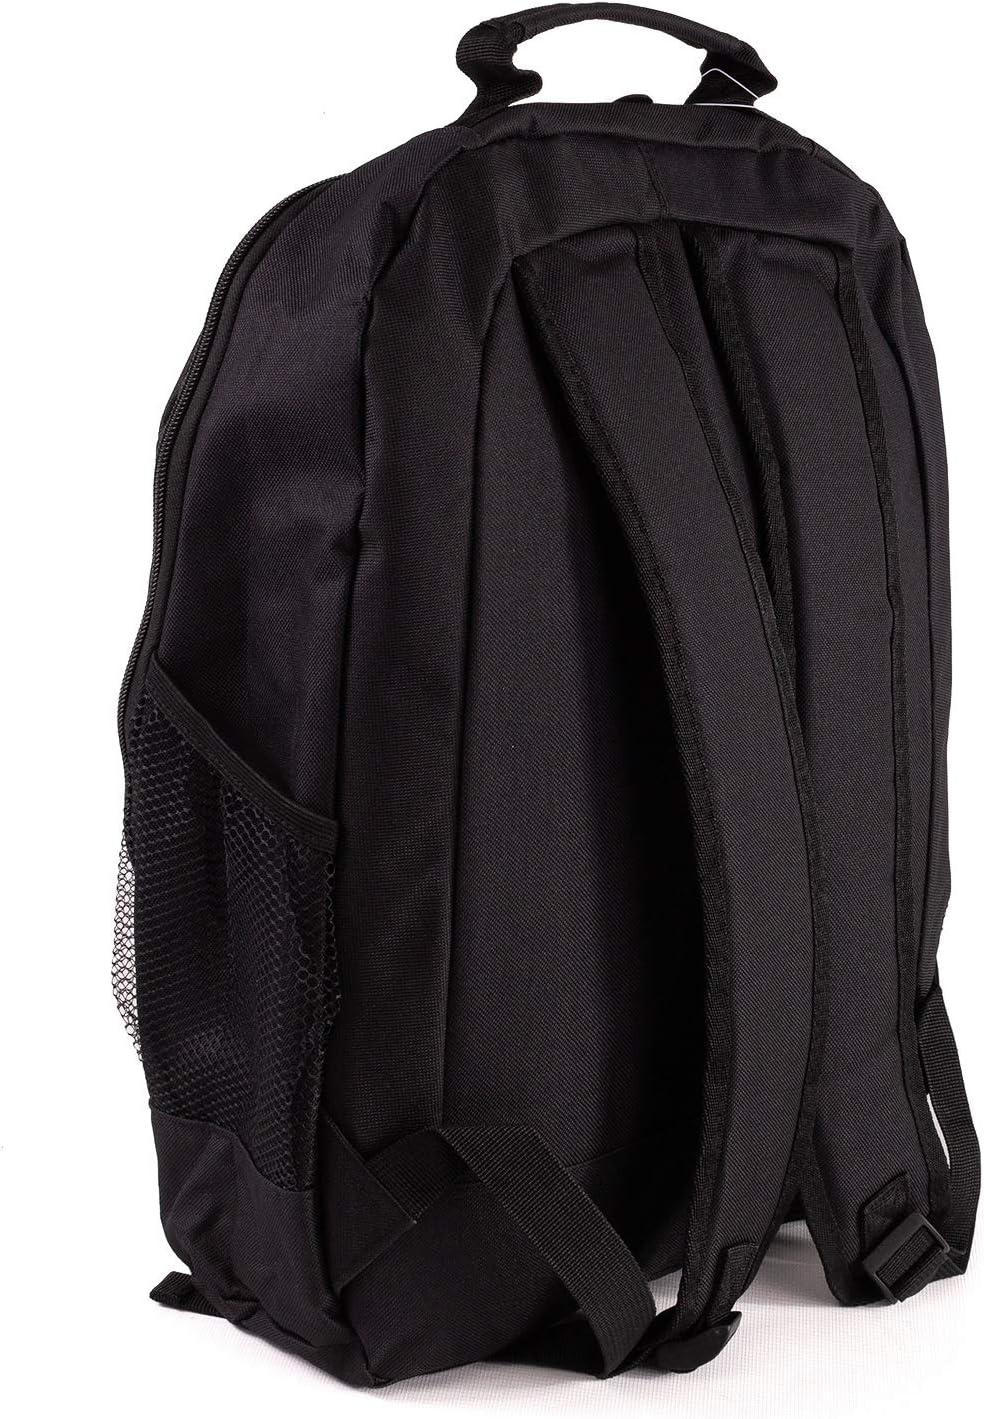 Forever Collectibles NBA Golden State Warriors Back To School Backpack Black Bag Rucksack Tasche